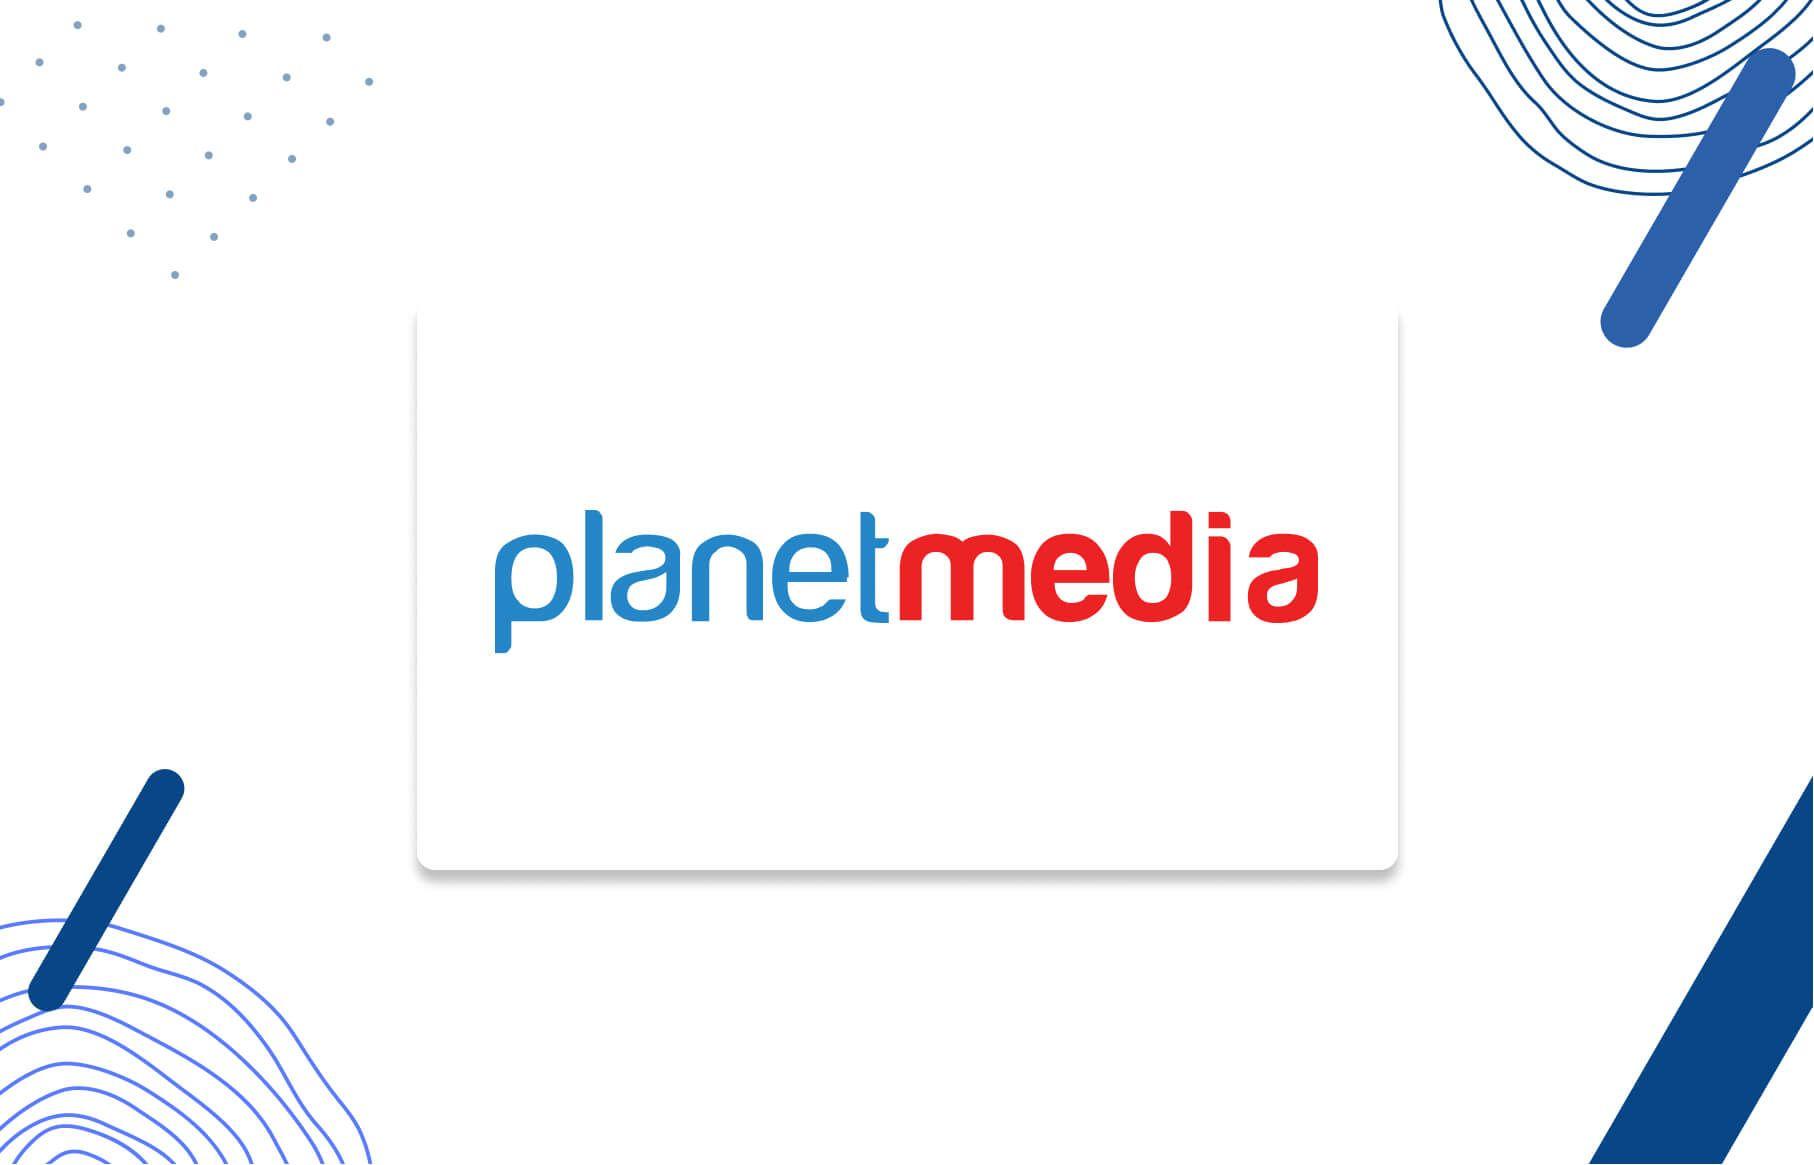 Planetmedia Logo - Your digital growth partner